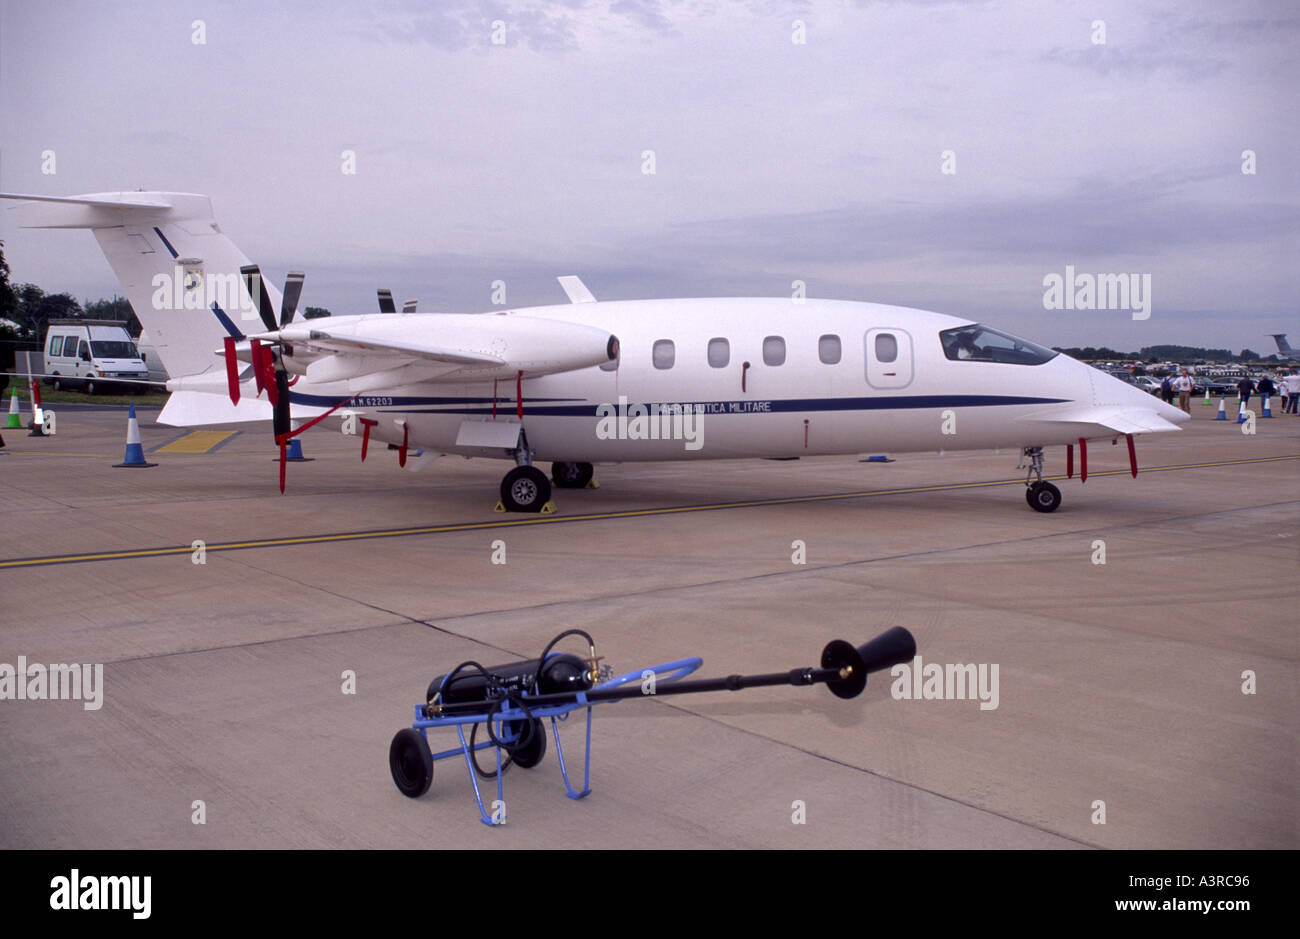 Italian Piaggio P180 Avanti is a twin-engine business aircraft - Stock Image